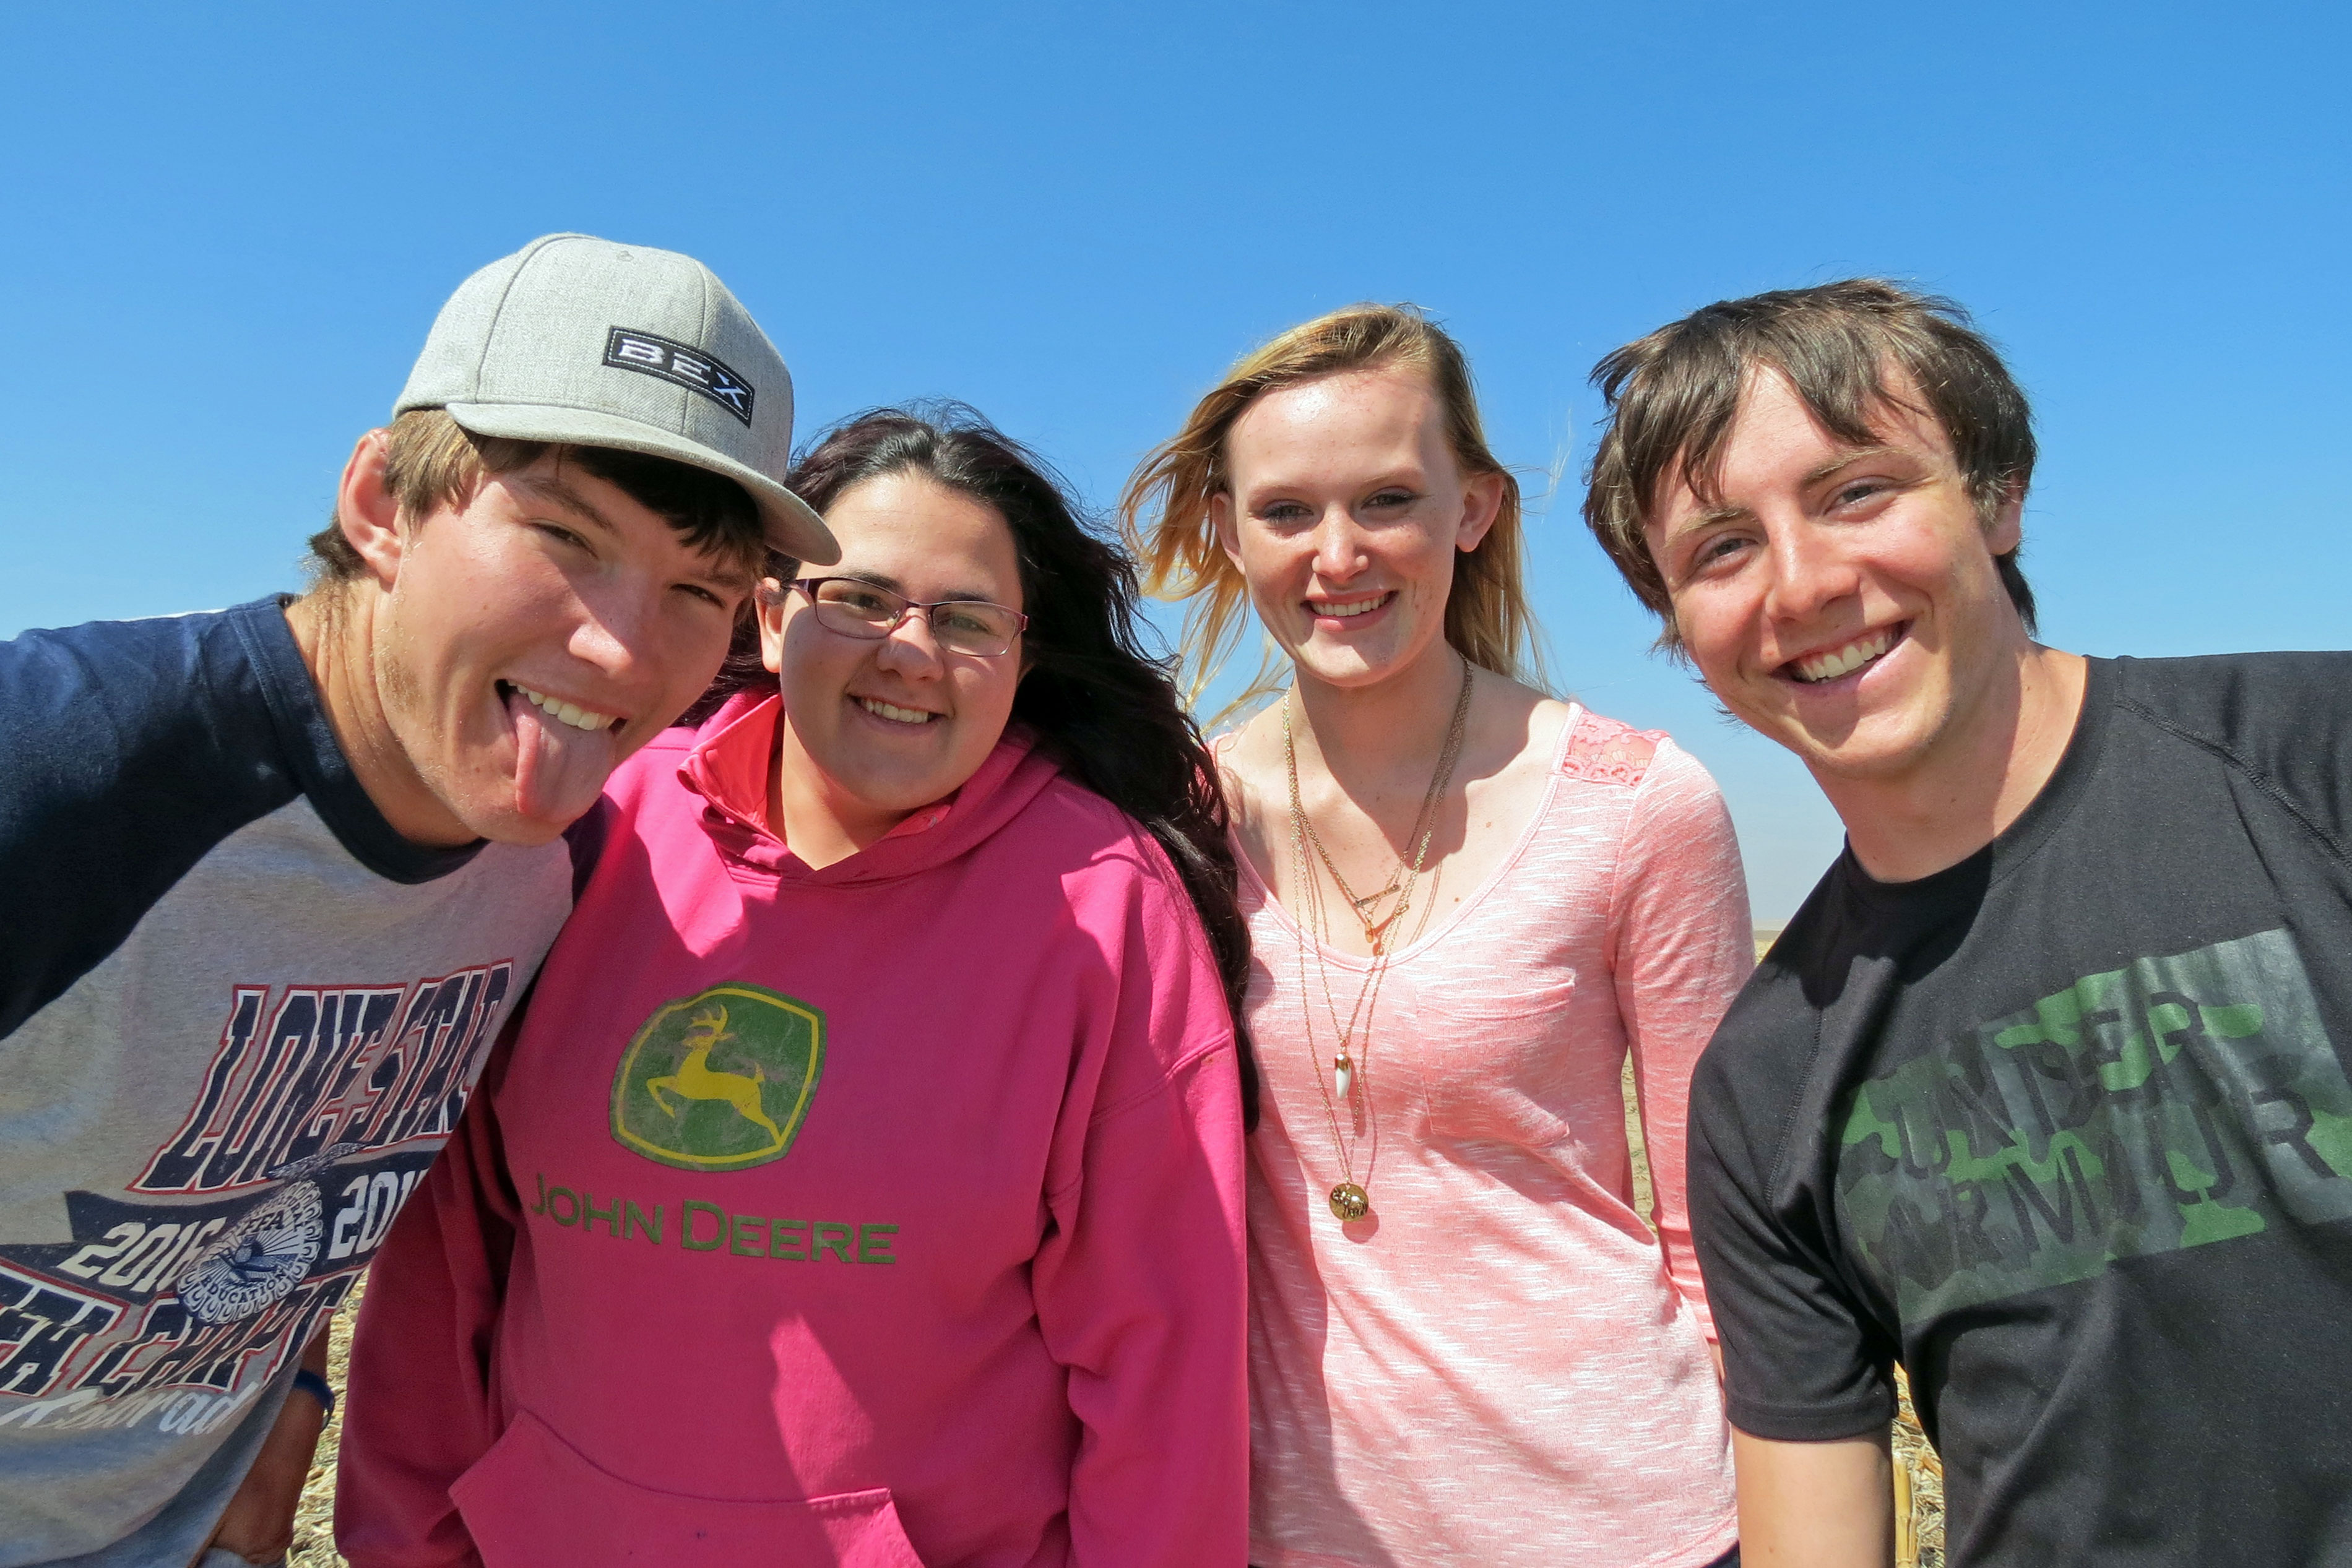 Photo: Lone Star Grads 1 | 4 Students - JBrundin